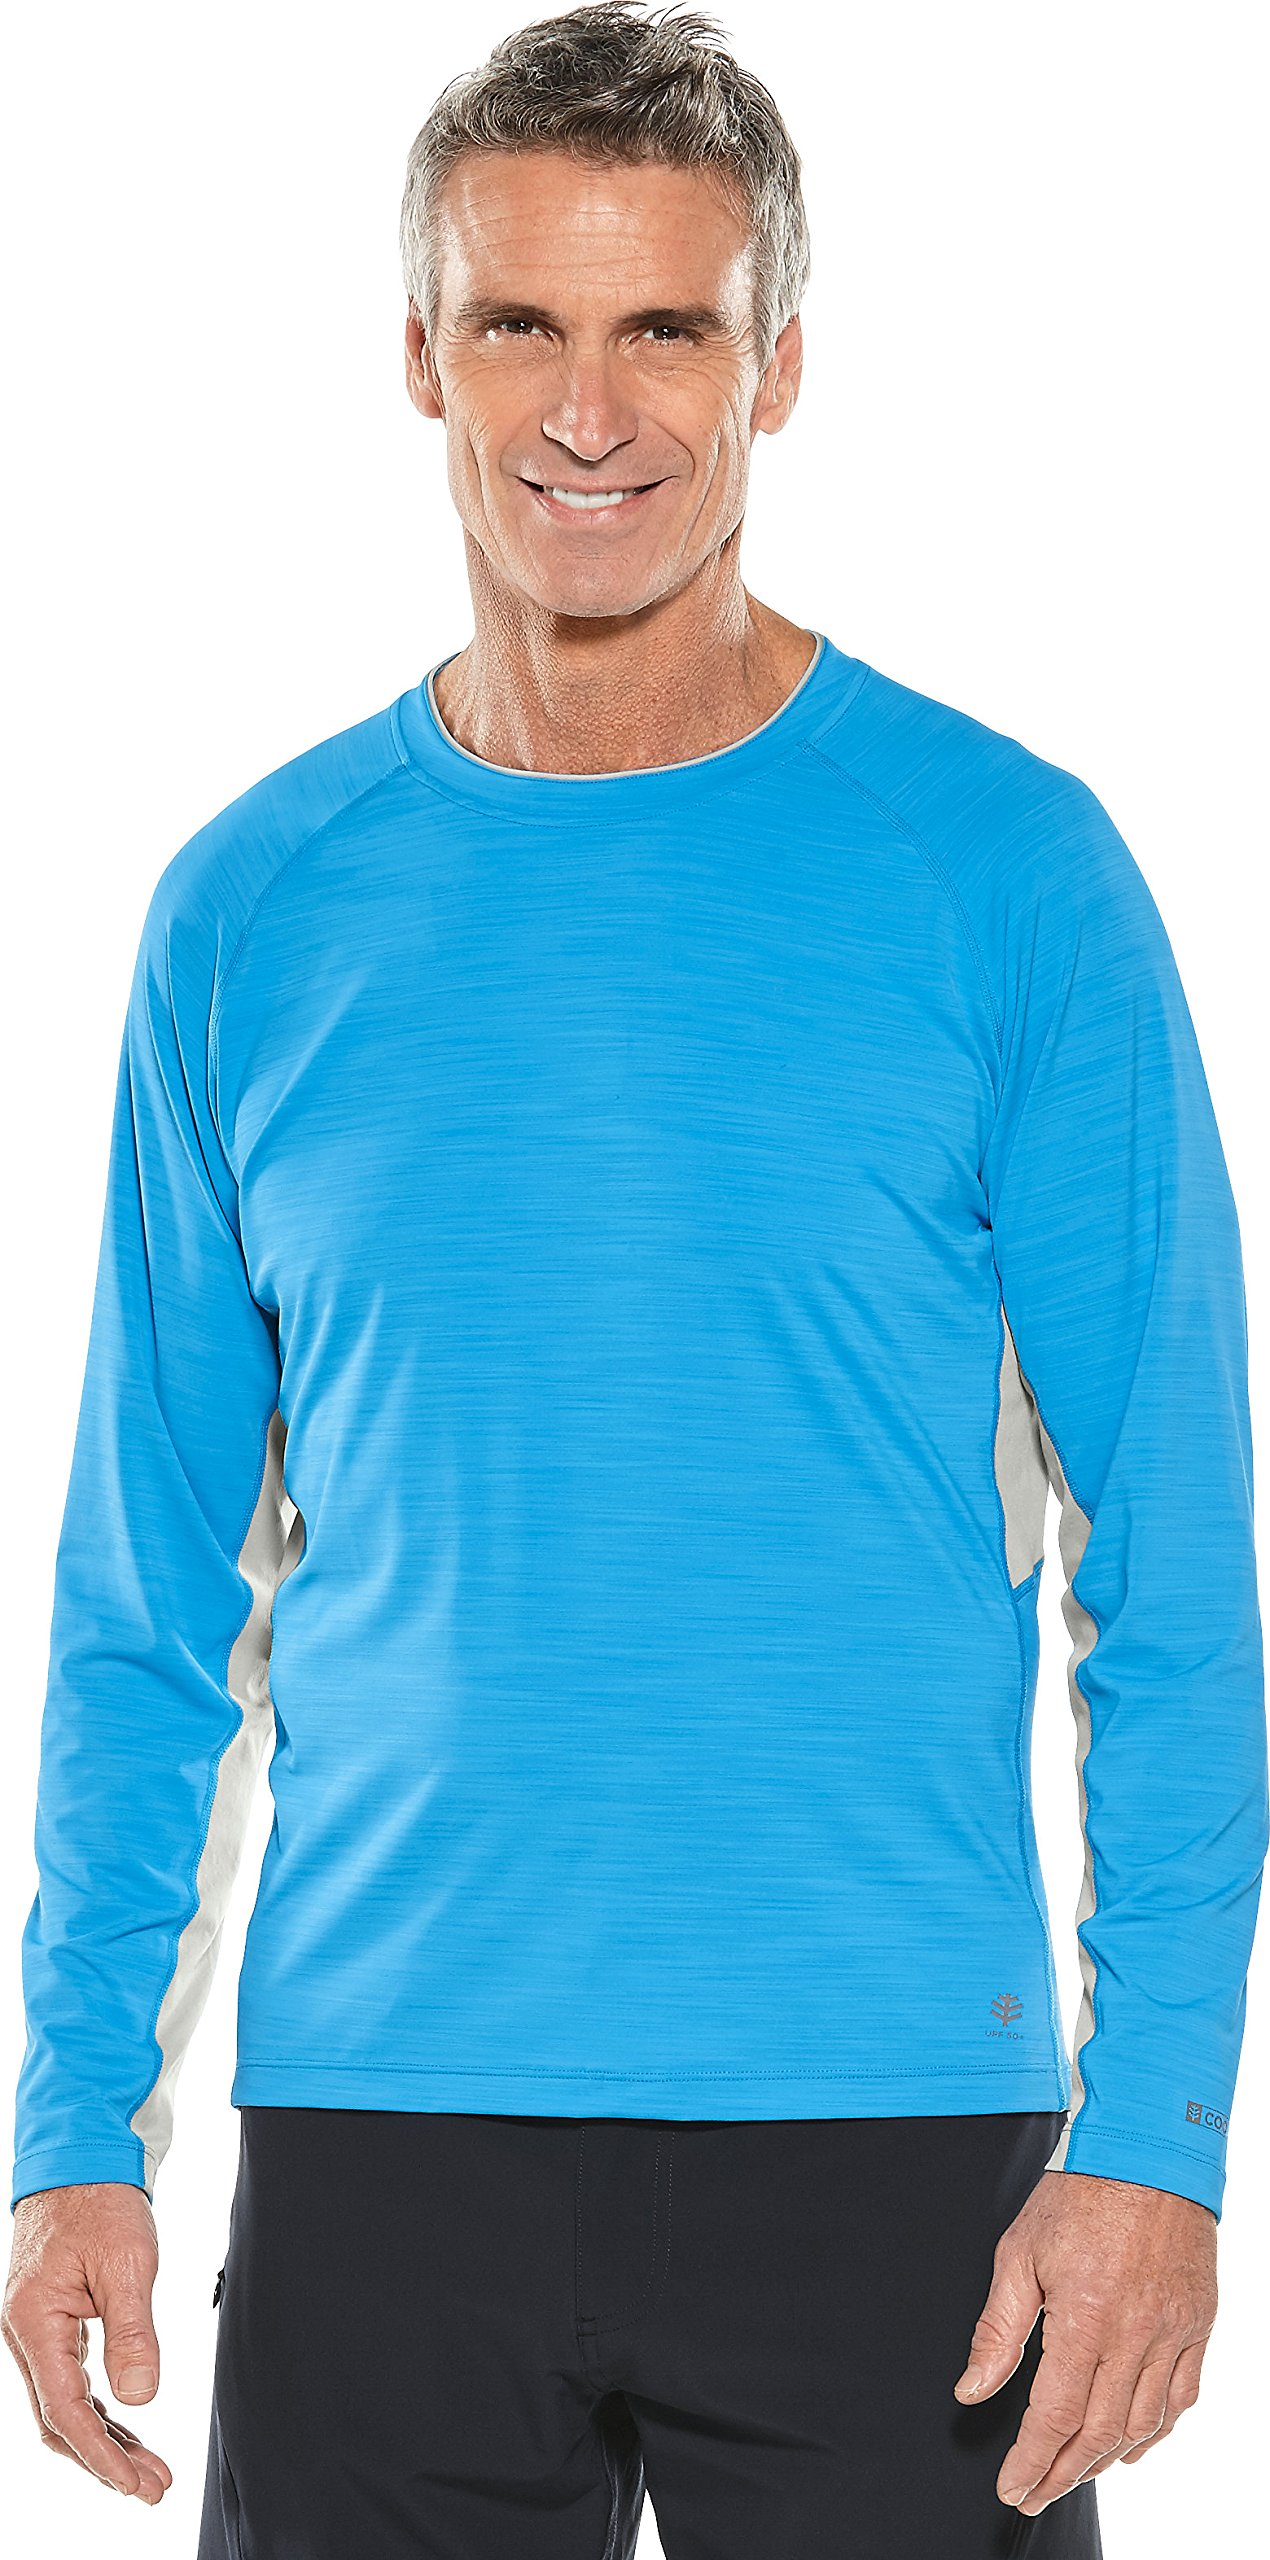 Coolibar UPF 50+ Men's Long Sleeve Ultimate Rash Guard - Sun Protective (Medium- Blue Water)